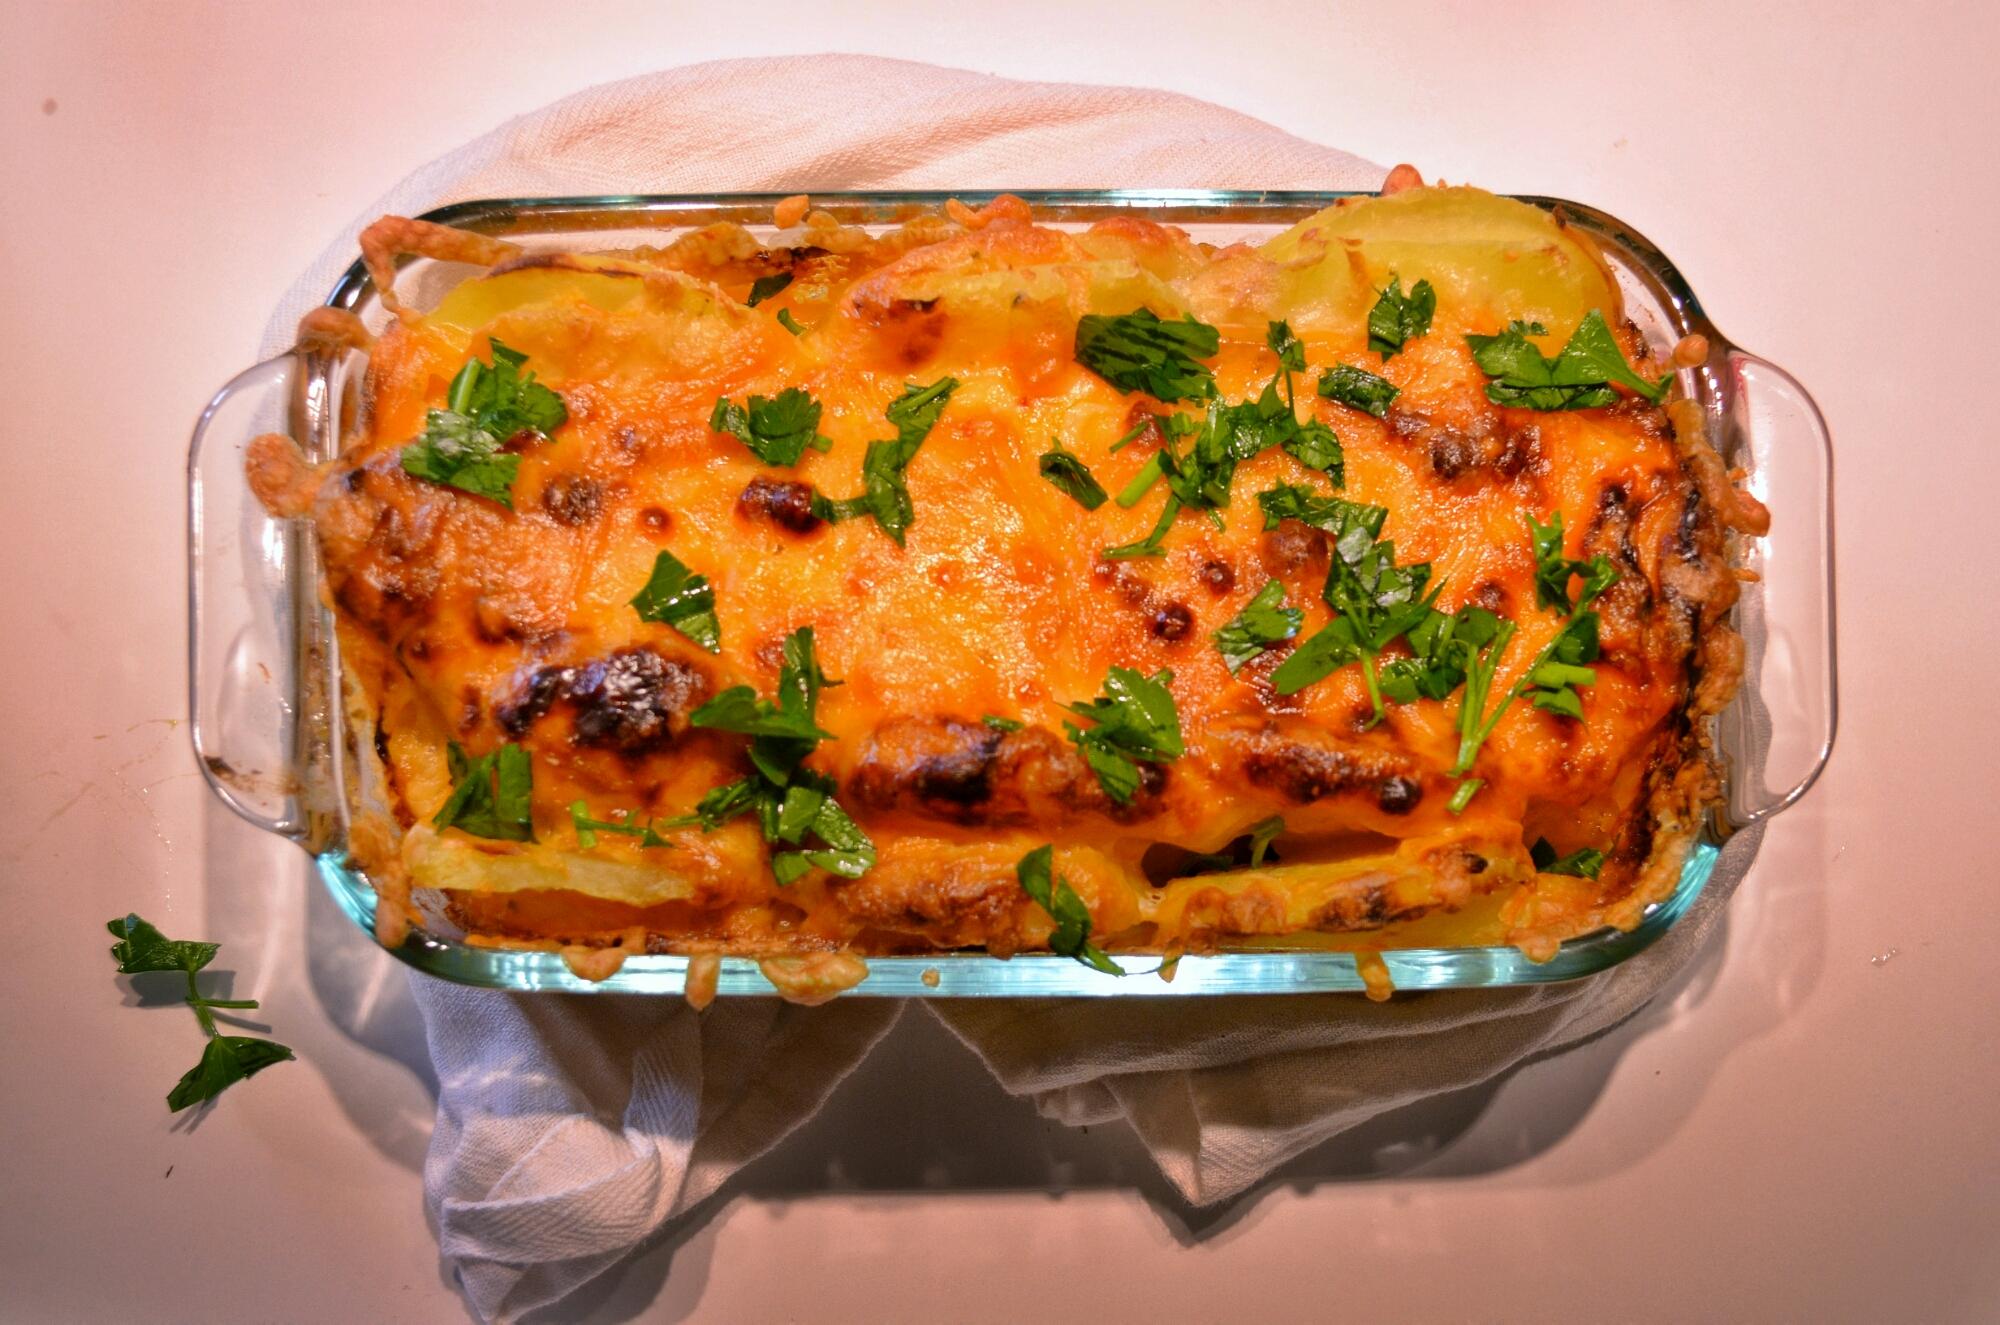 wp image 1192034747jpg - Cheesy Scalloped Potatoes